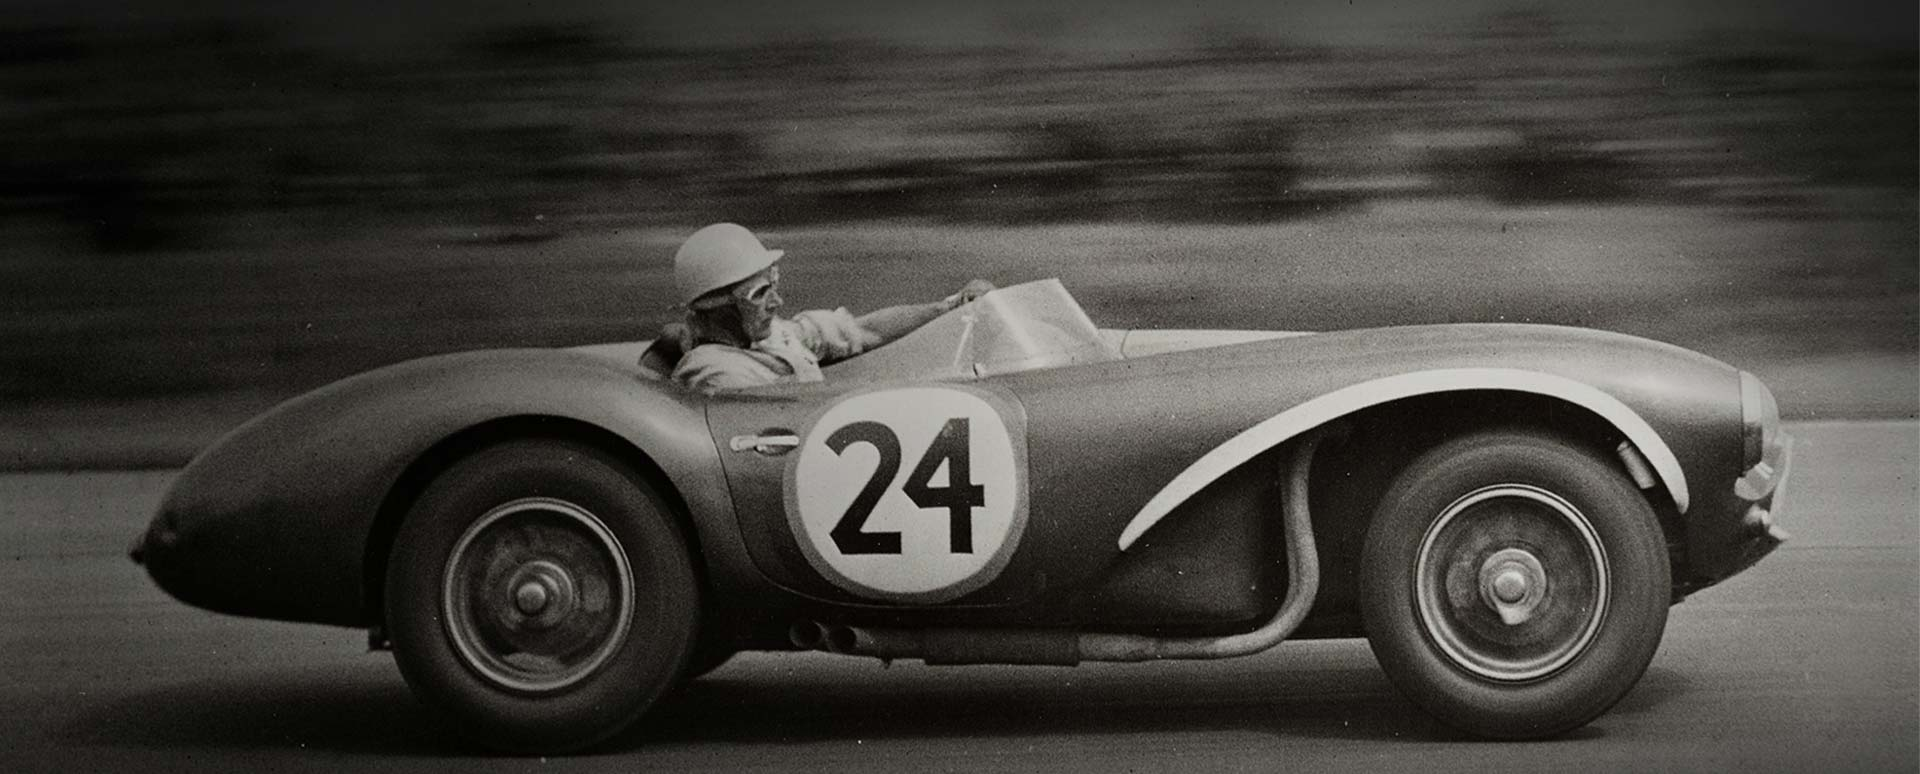 aston martin db3s, racing